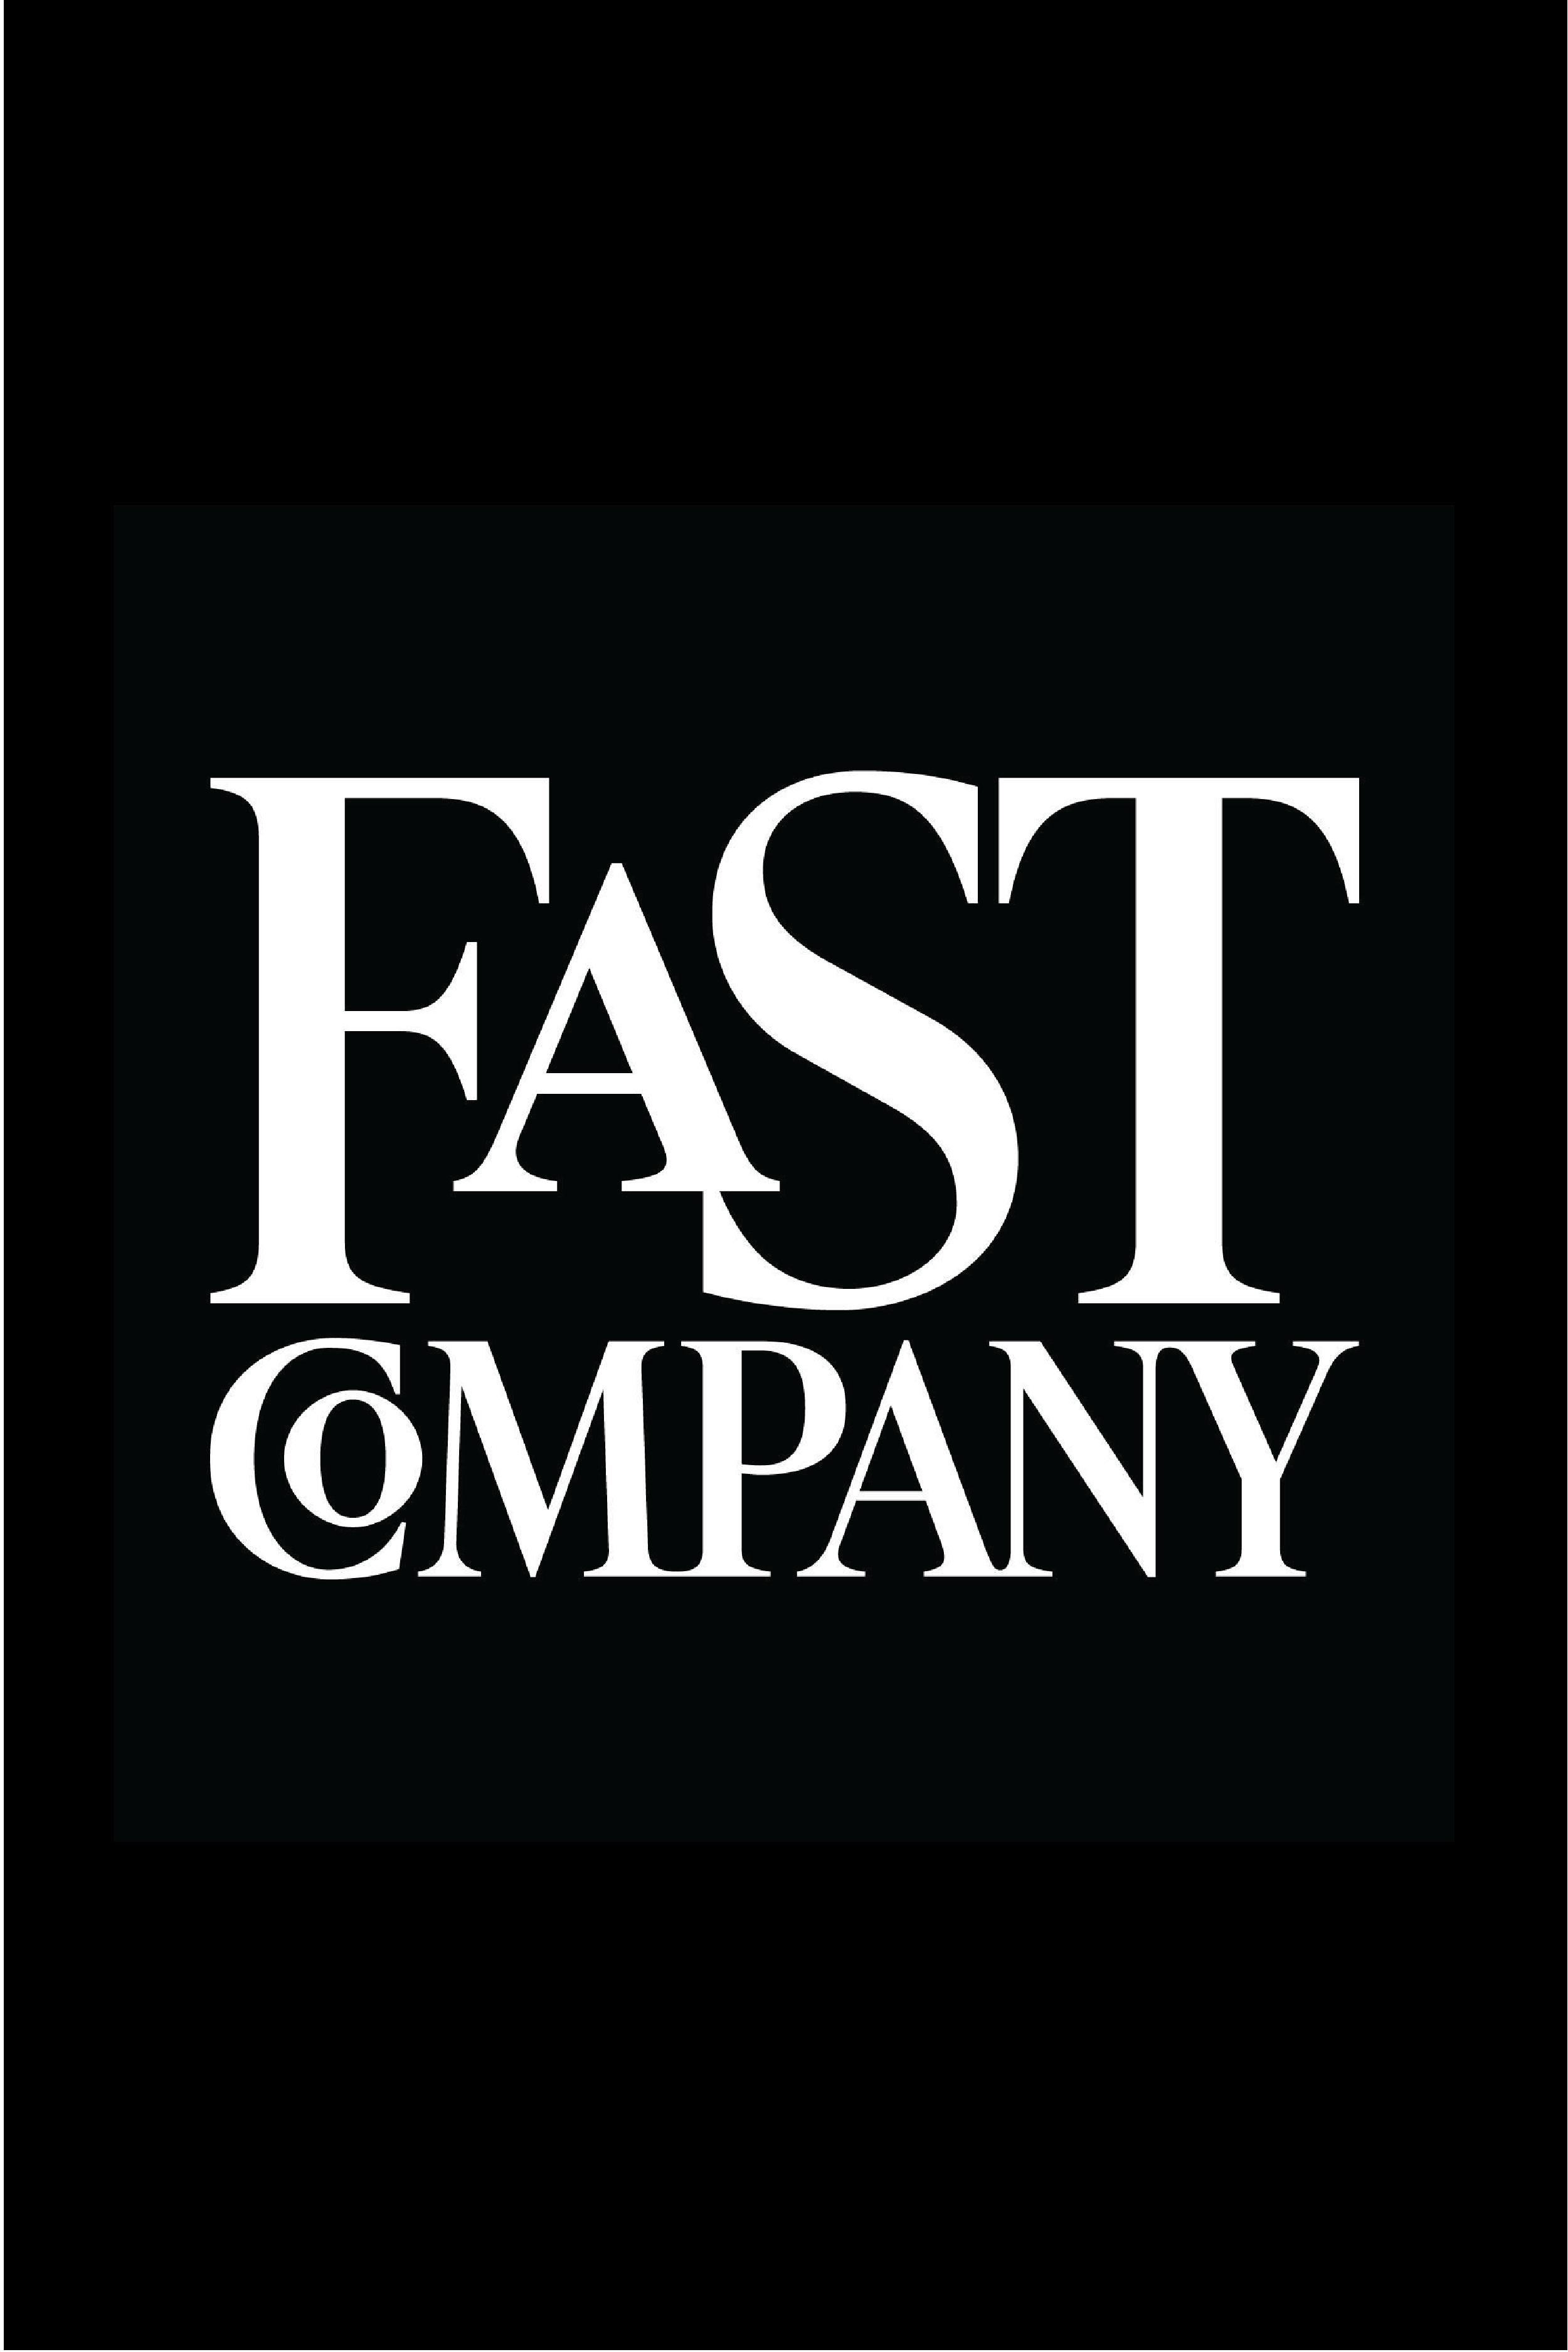 fastcompanysquare-01.png